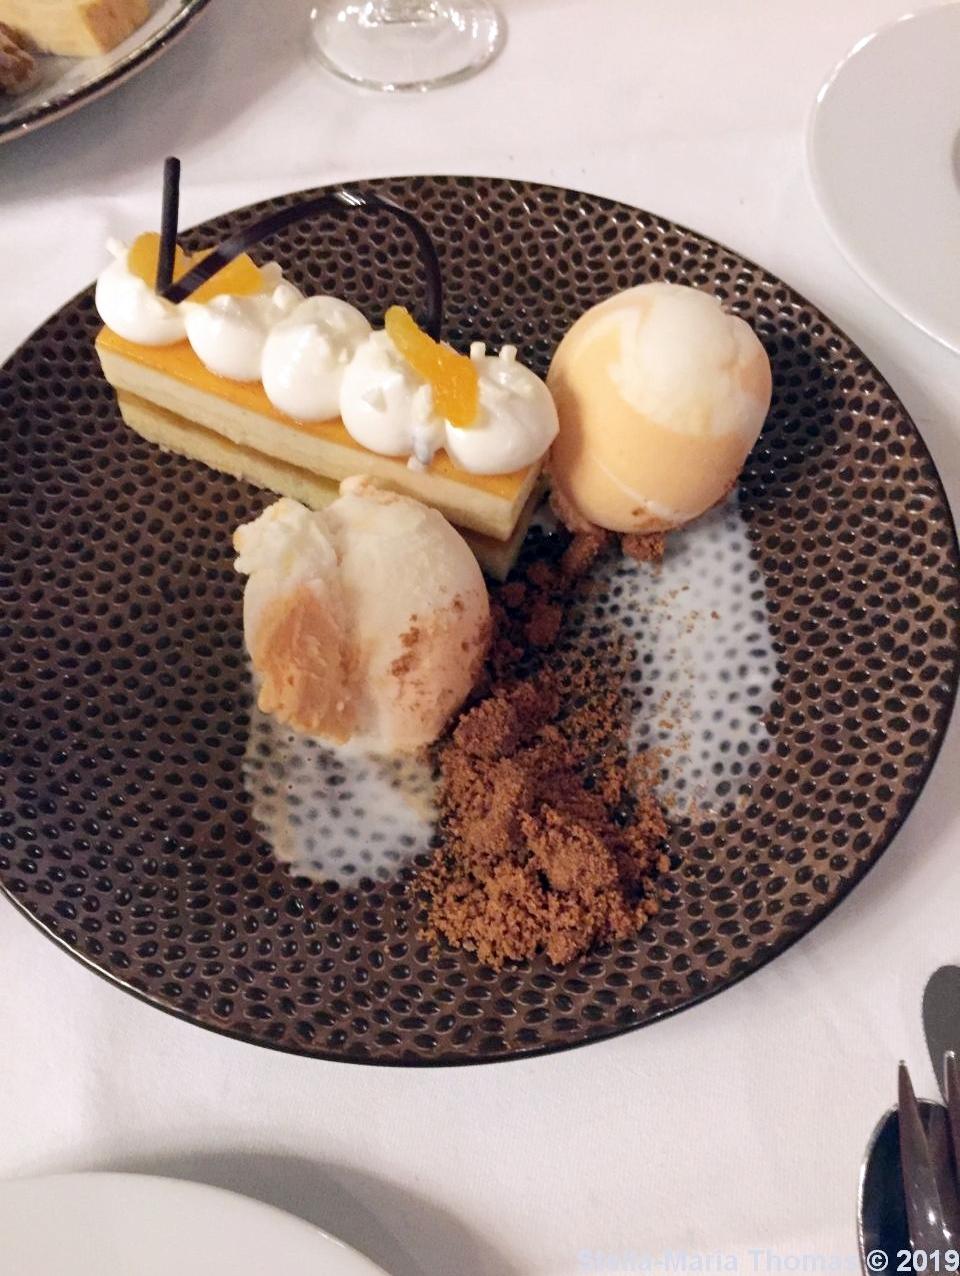 HOTEL KASTEEL BLOEMENDAL. WHITE CHOCOLATE AND APRICOT TART, STRUCTURES OF YOGURT 016